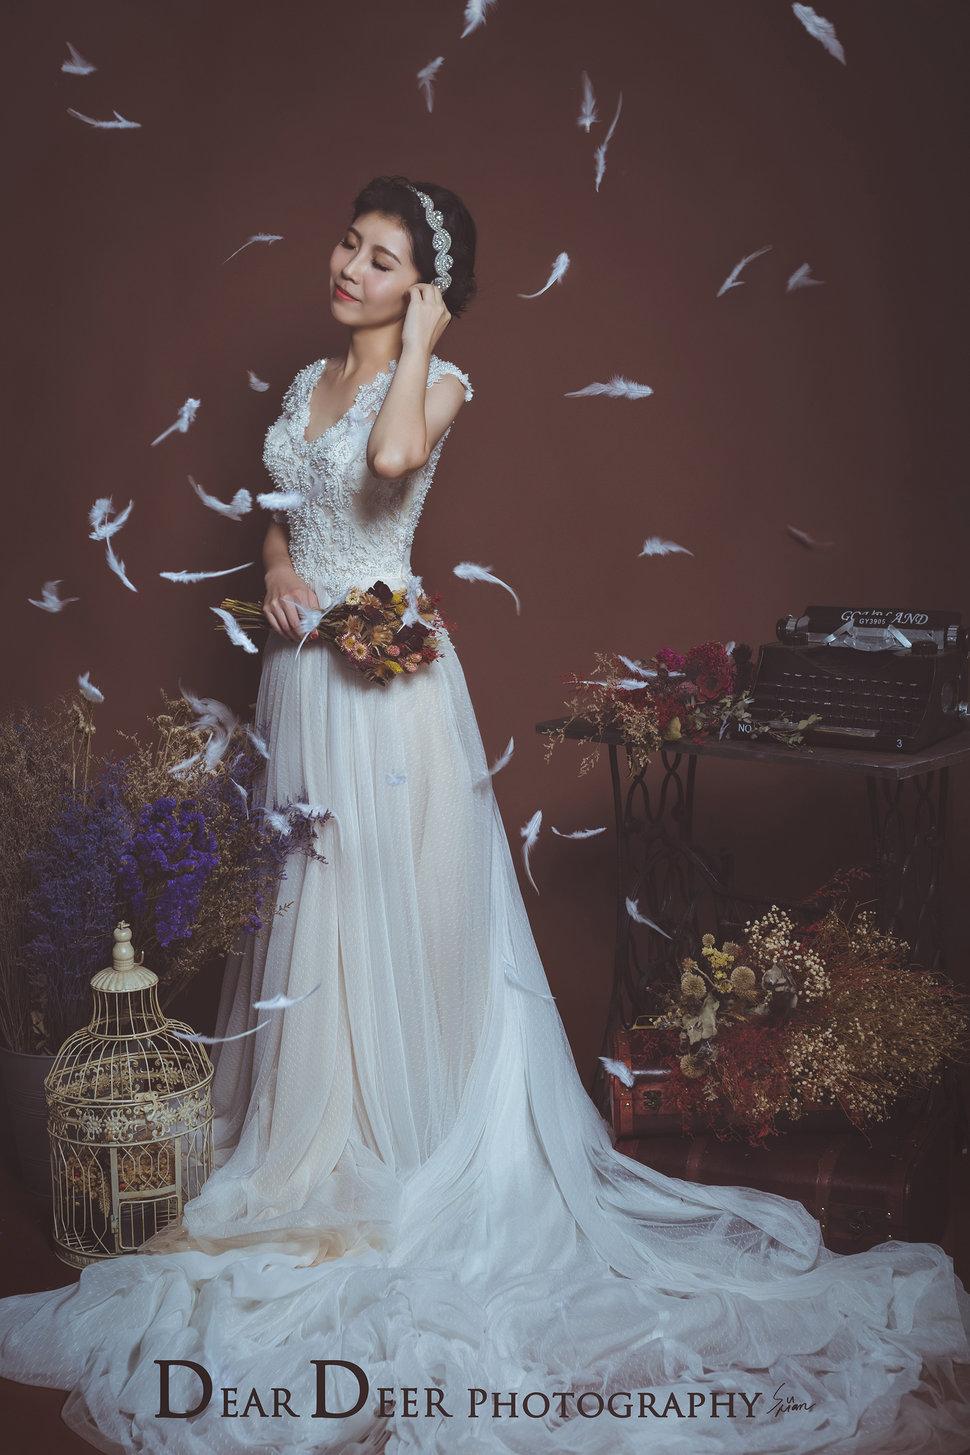 Dear Deer|復古風格(編號:1280294) - Dear Deer鹿兒攝影|女攝影師蘇蔓 - 結婚吧